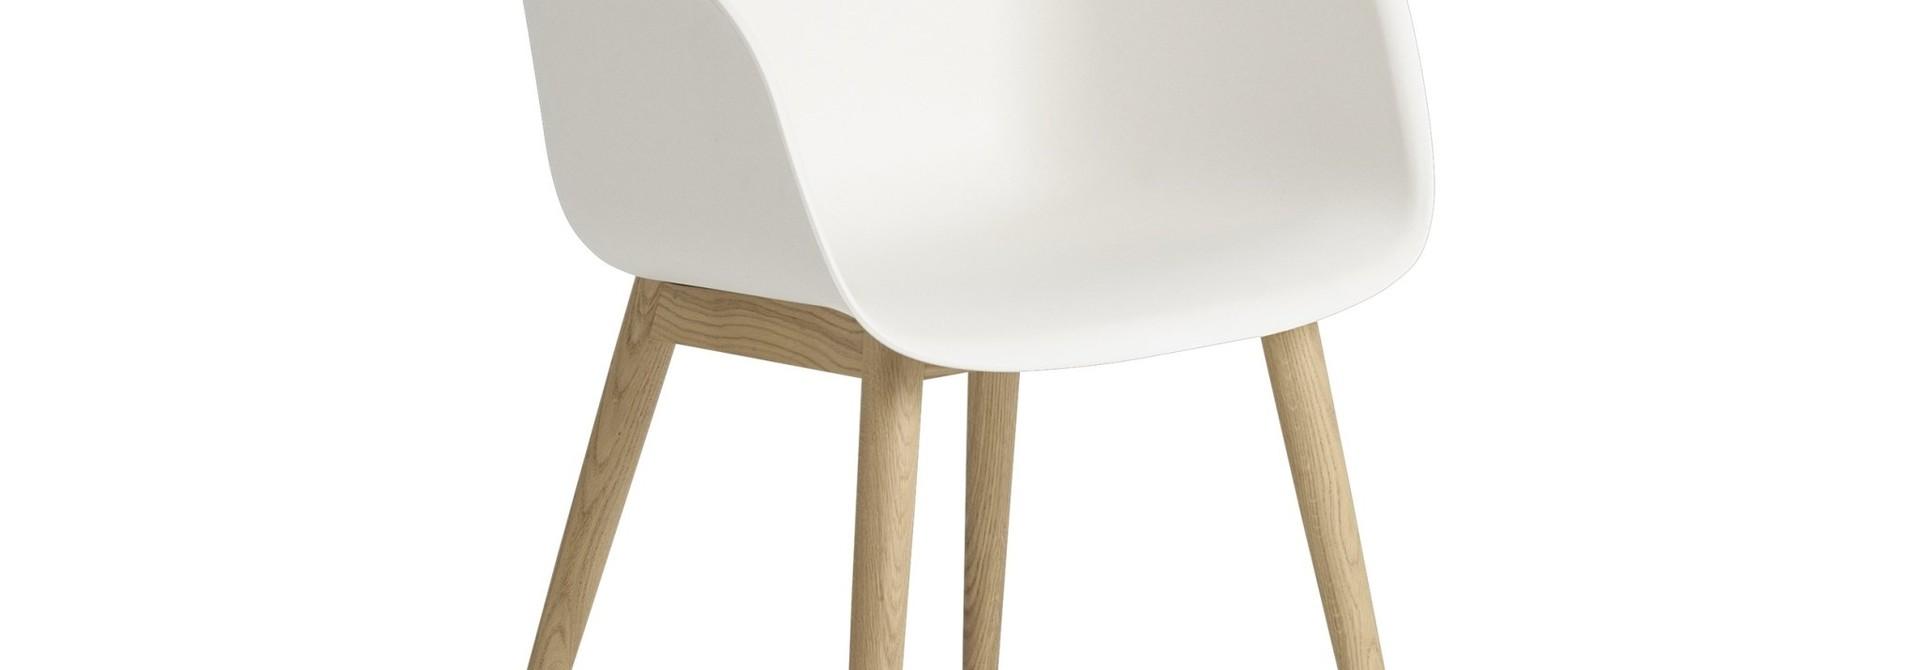 Fiber armchair wood base